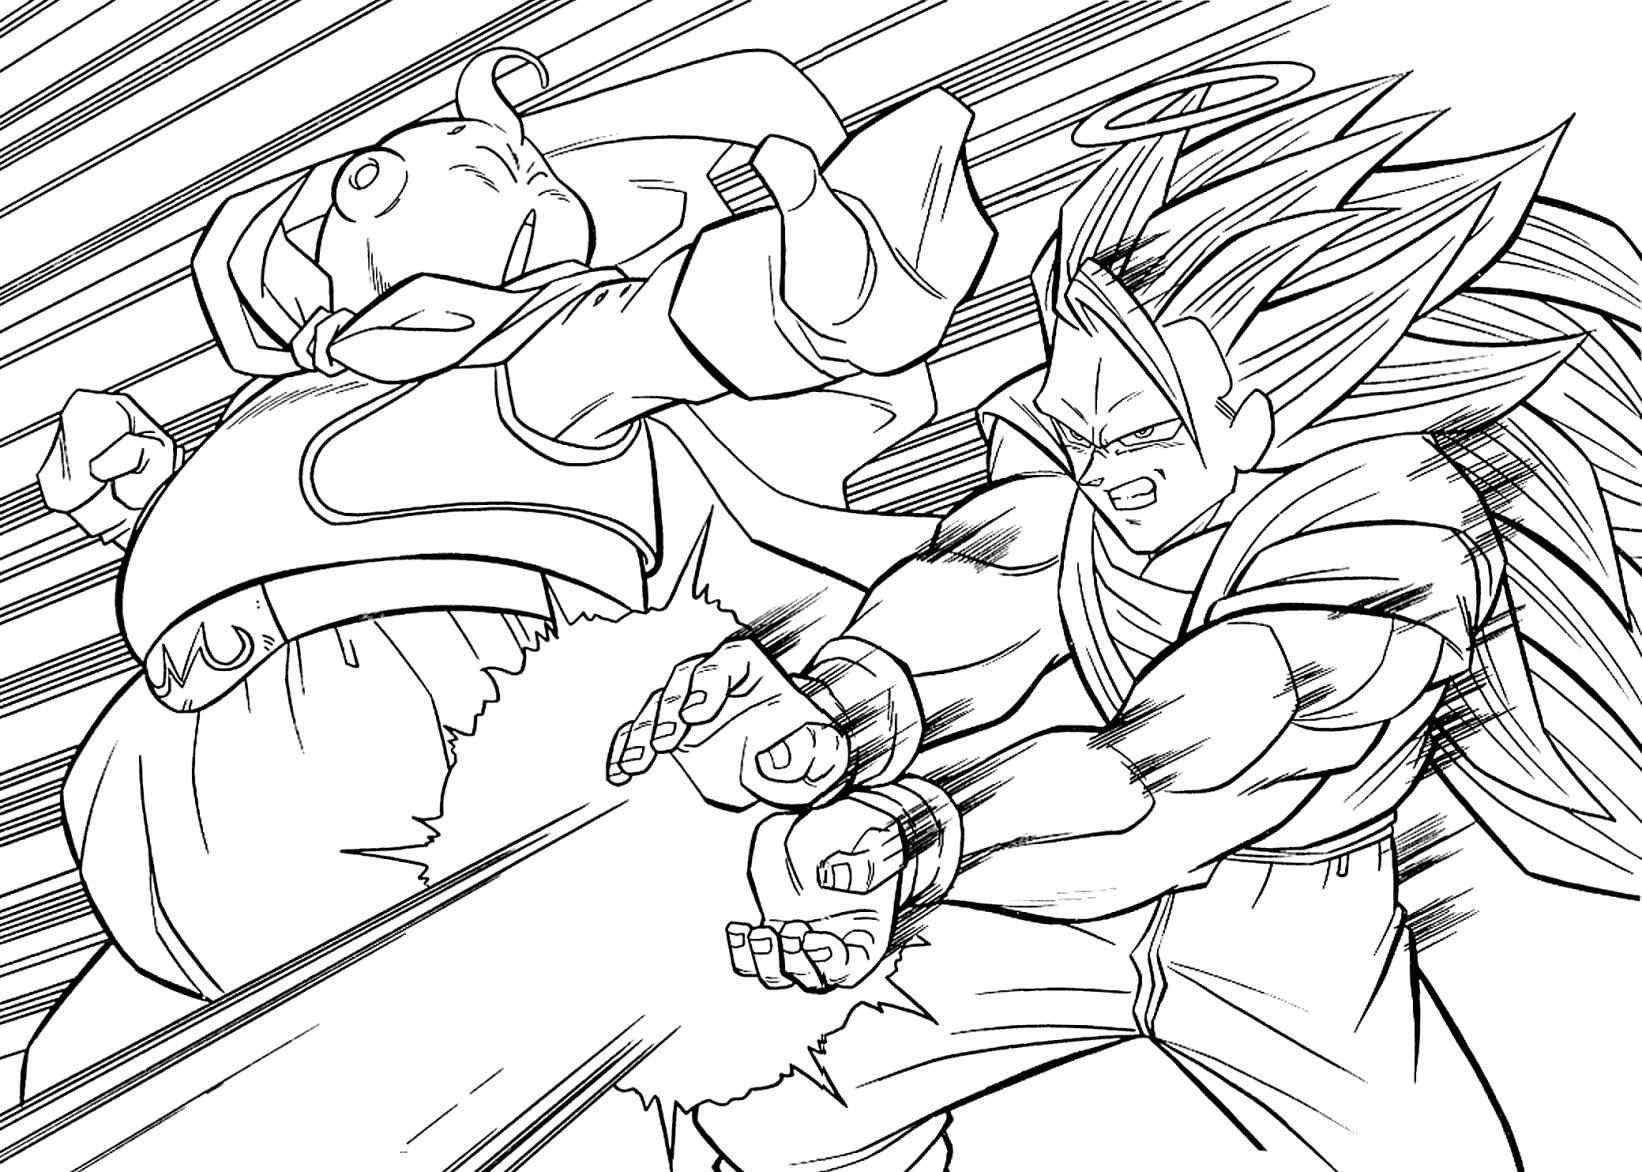 Dragon Ball Z Goku Super Saiyan 3 Coloring Pages Online Picturesque Dibujos Dibujos De Dragon Personajes De Dragon Ball